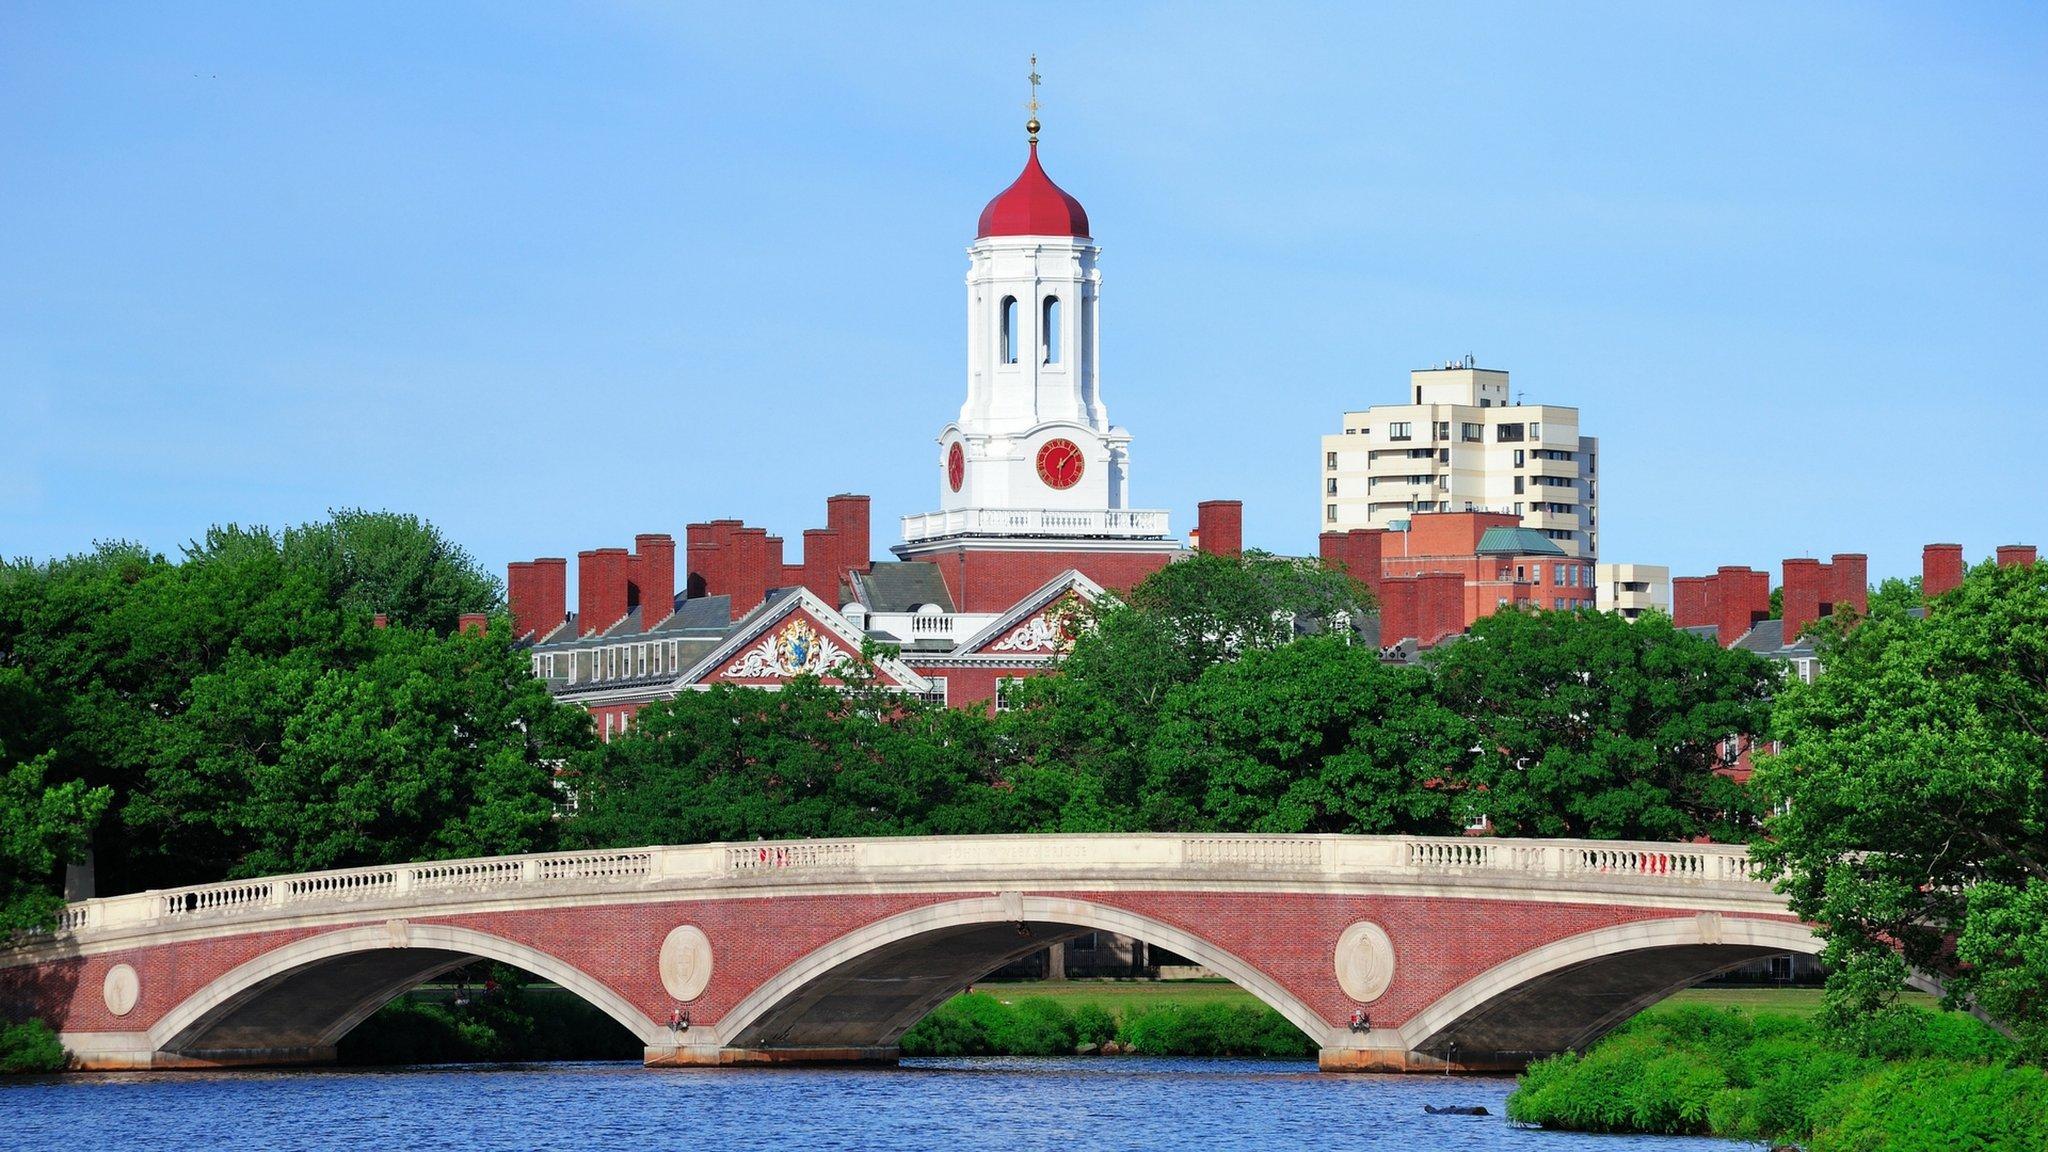 bentley travel college travelocity desktopretina hotels c near from cheap deals hotel boston guide